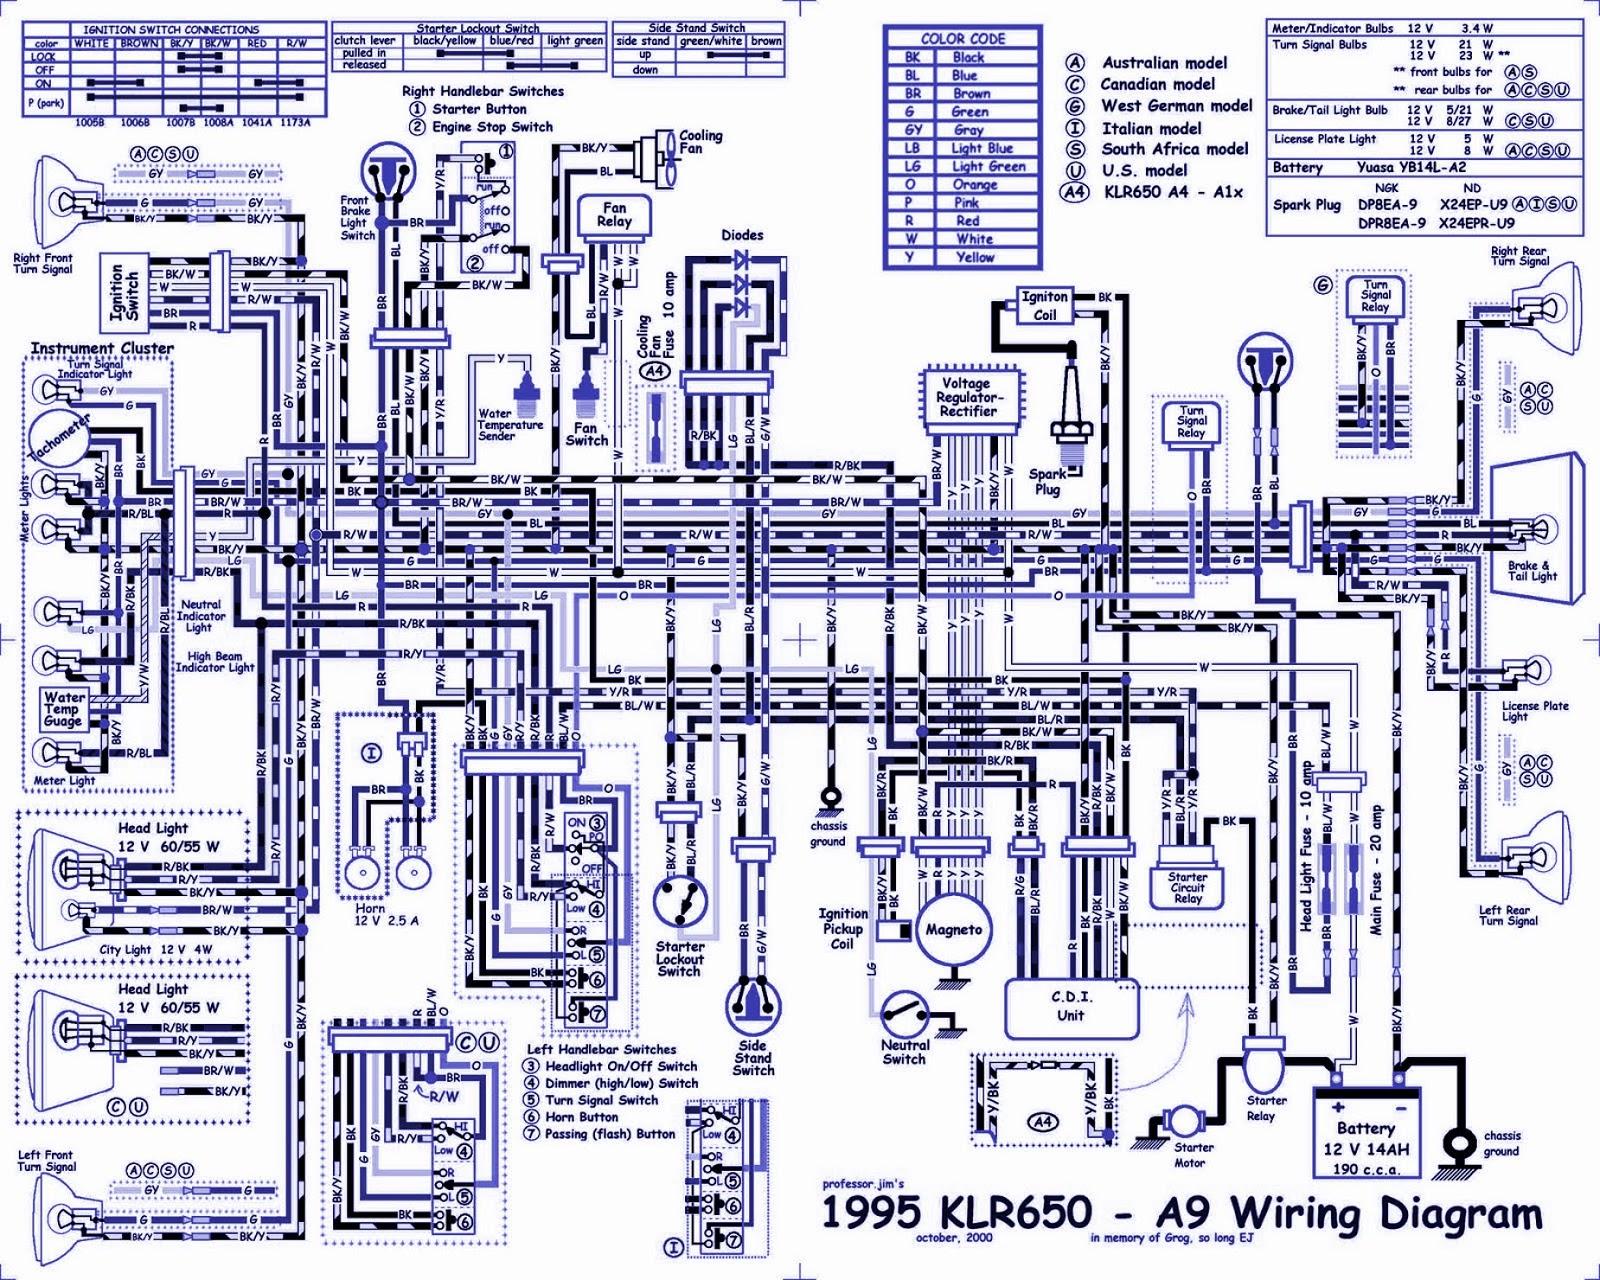 Terrific Saab 9 3 Headlight Wiring Diagram Somurich Com Wiring Cloud Onicaalyptbenolwigegmohammedshrineorg